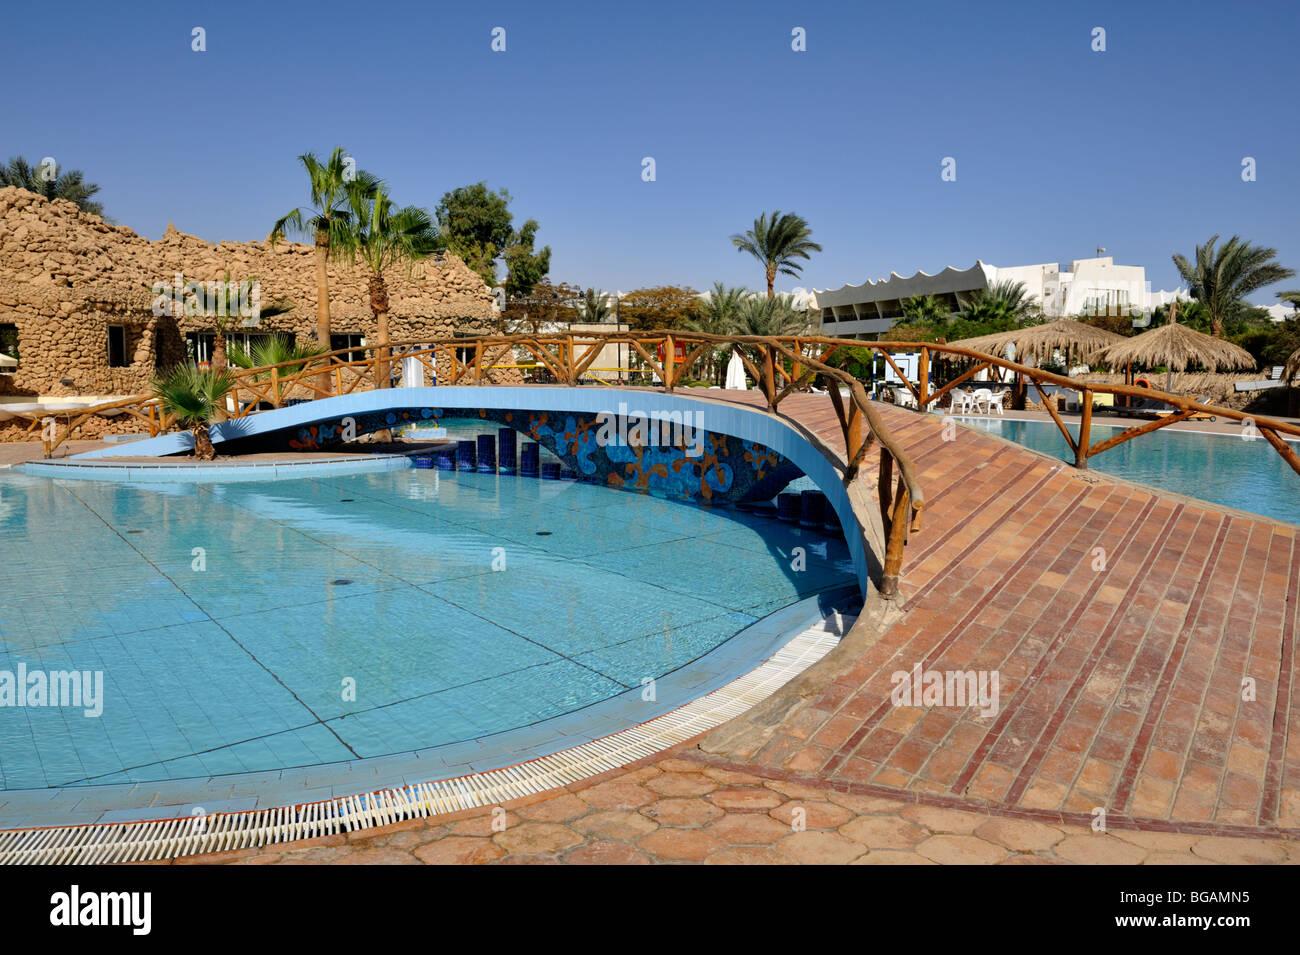 Swimming pool 'Hilton Nuweiba Coral Resort', Nuweiba, Sinai, Egypt - Stock Image